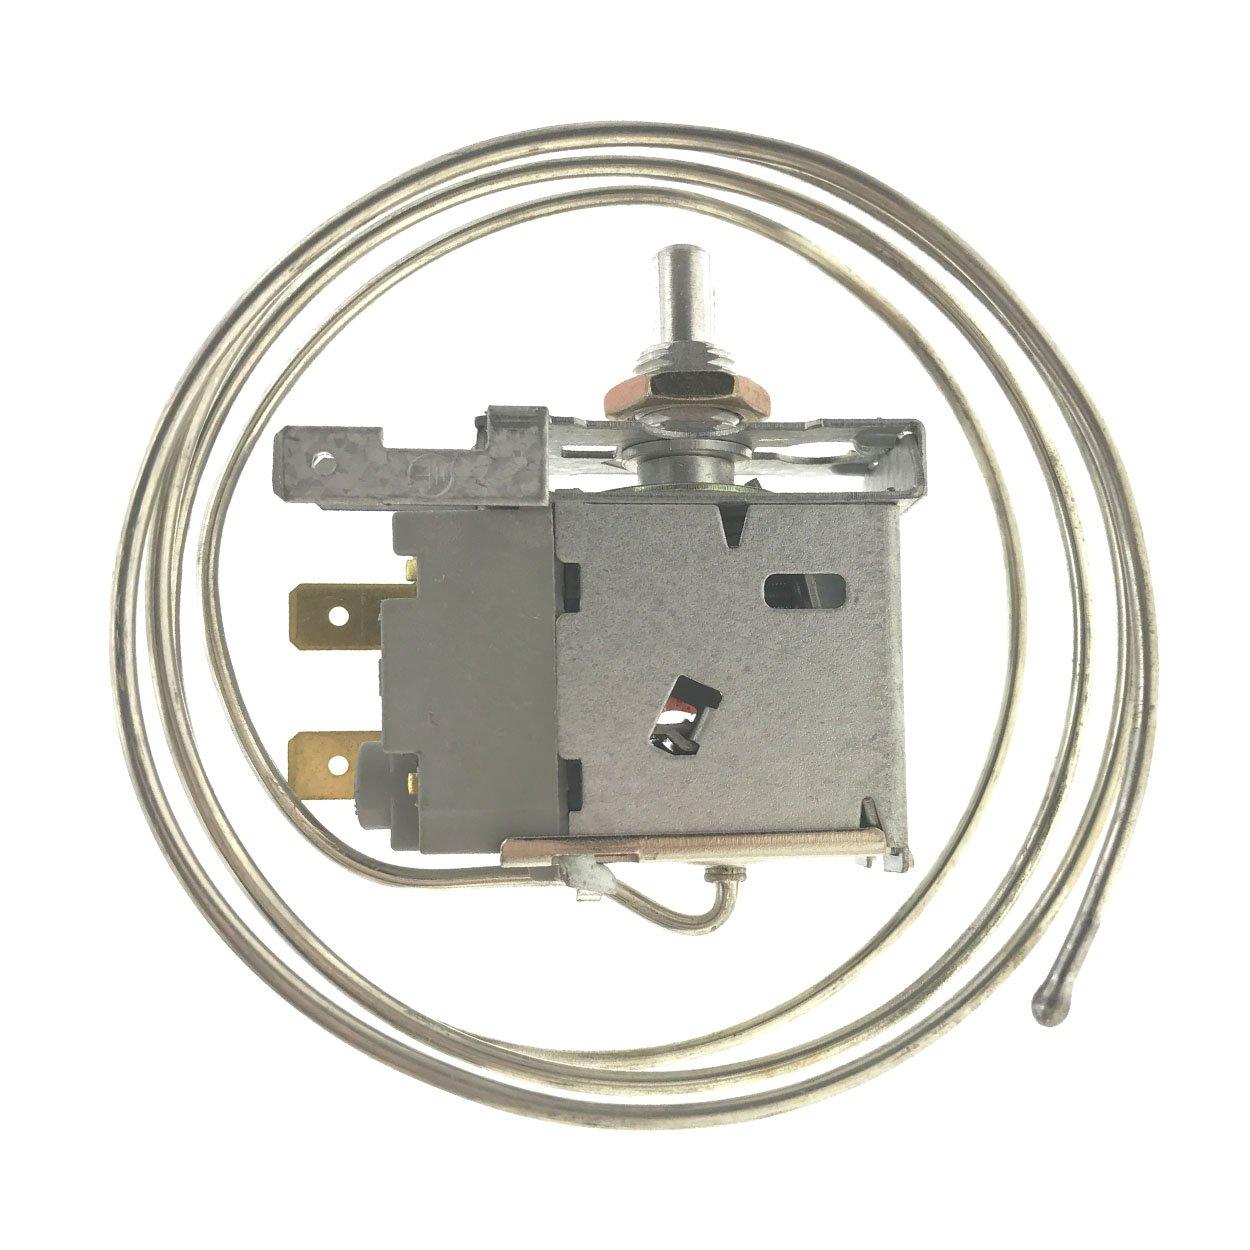 2 Pin PF-20 Terminals Freezer Refrigerator Thermostat with etal Cord GYFYB US